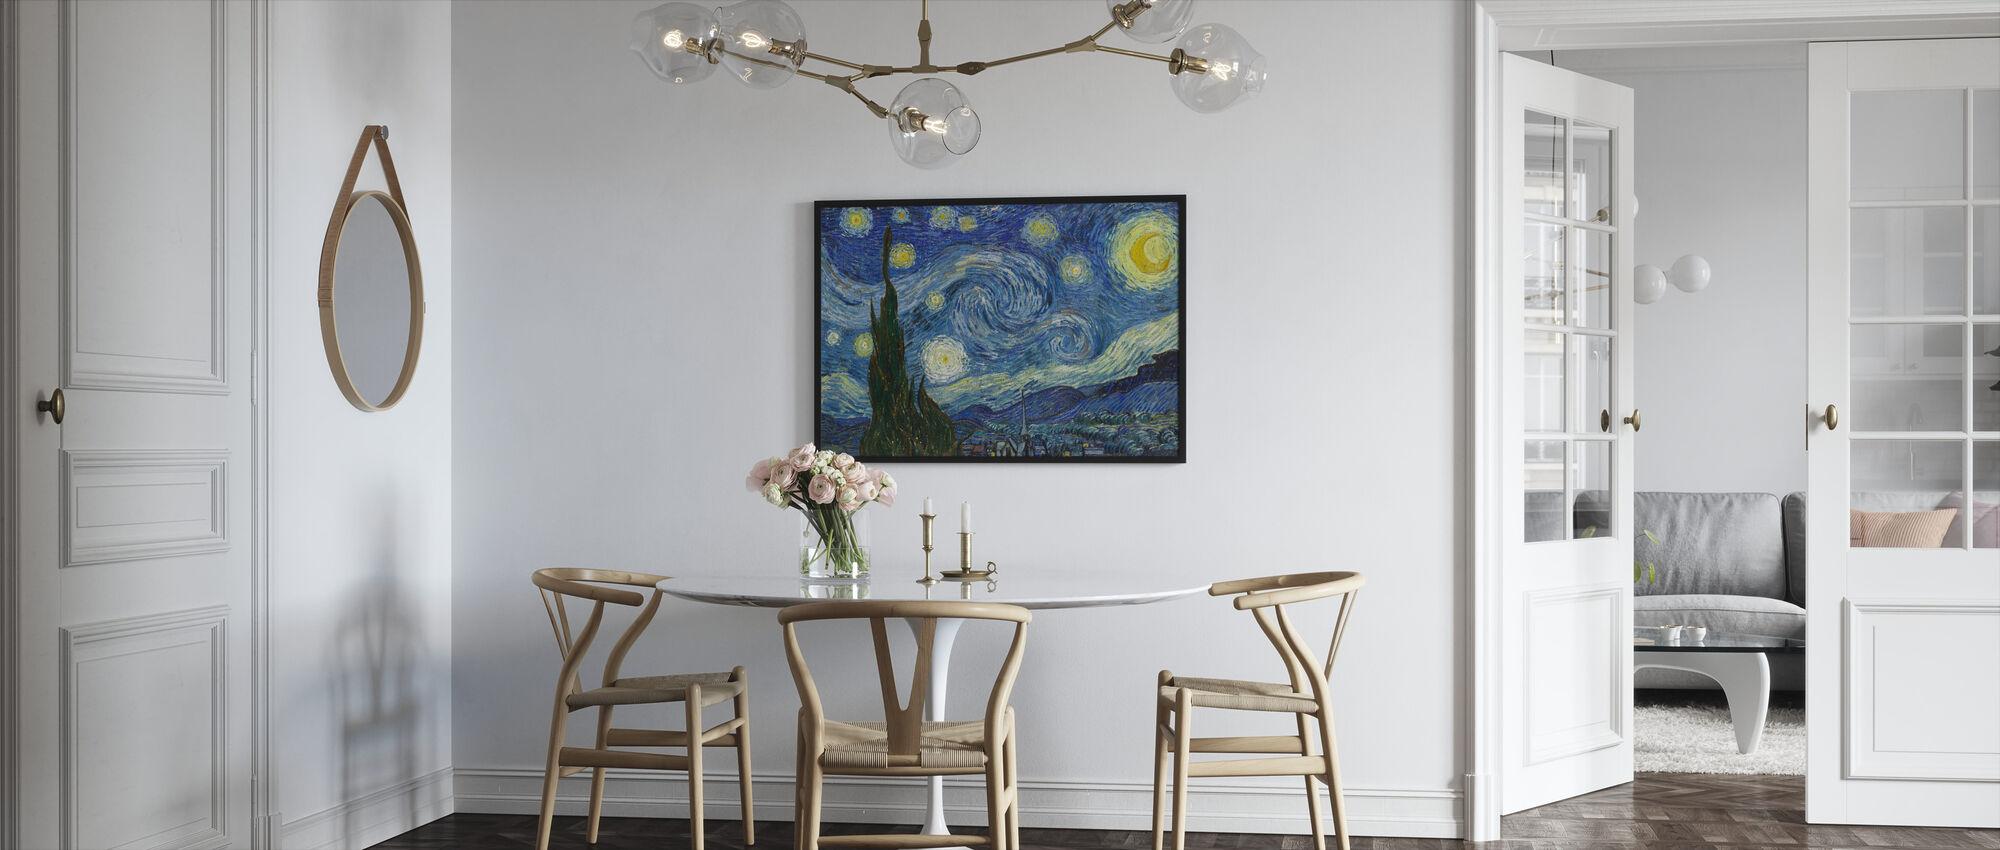 Vincent Van Gogh - Starry natt - Inramad tavla - Kök